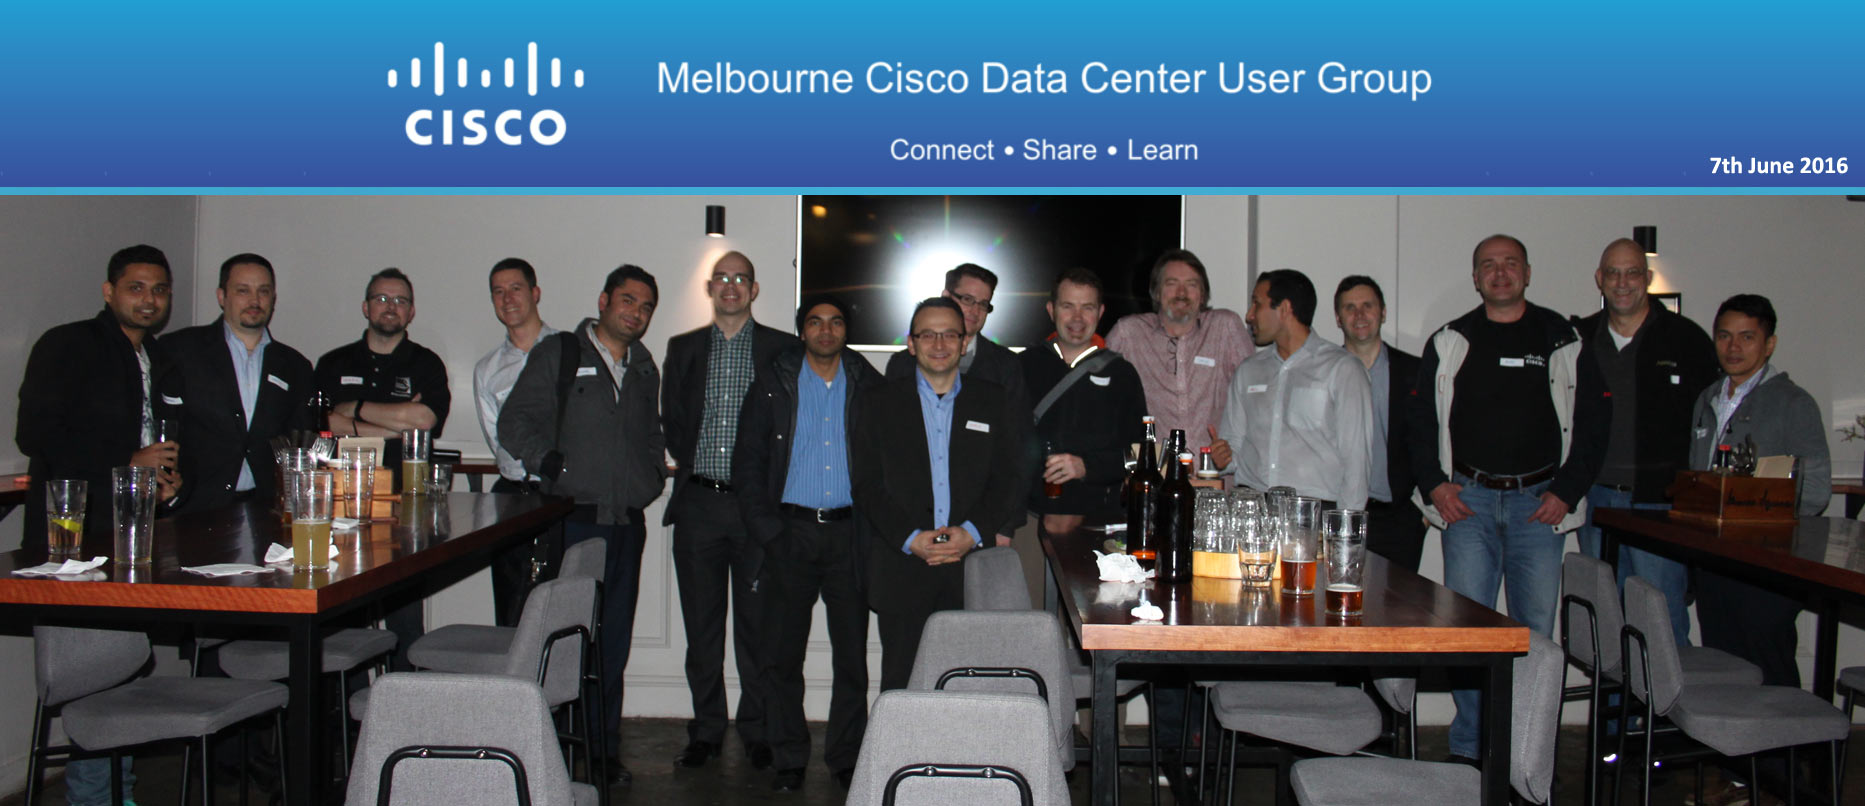 Cisco DCUG Melbourne Members photo